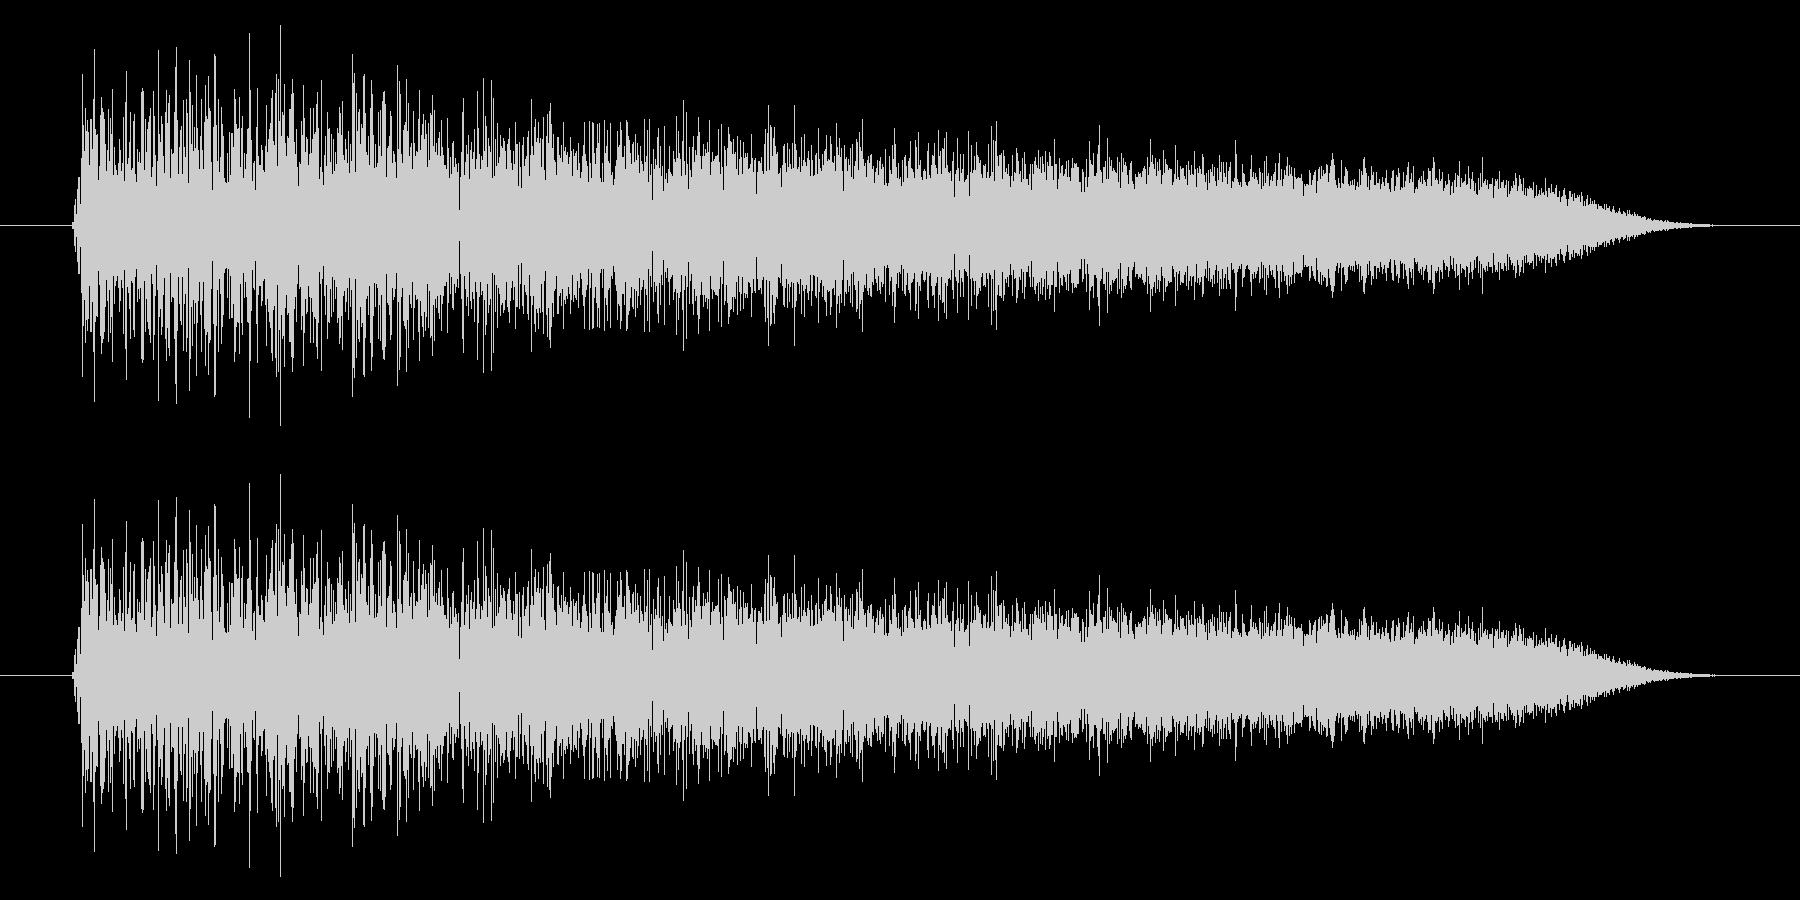 SNES シューティング02-07(特殊の未再生の波形